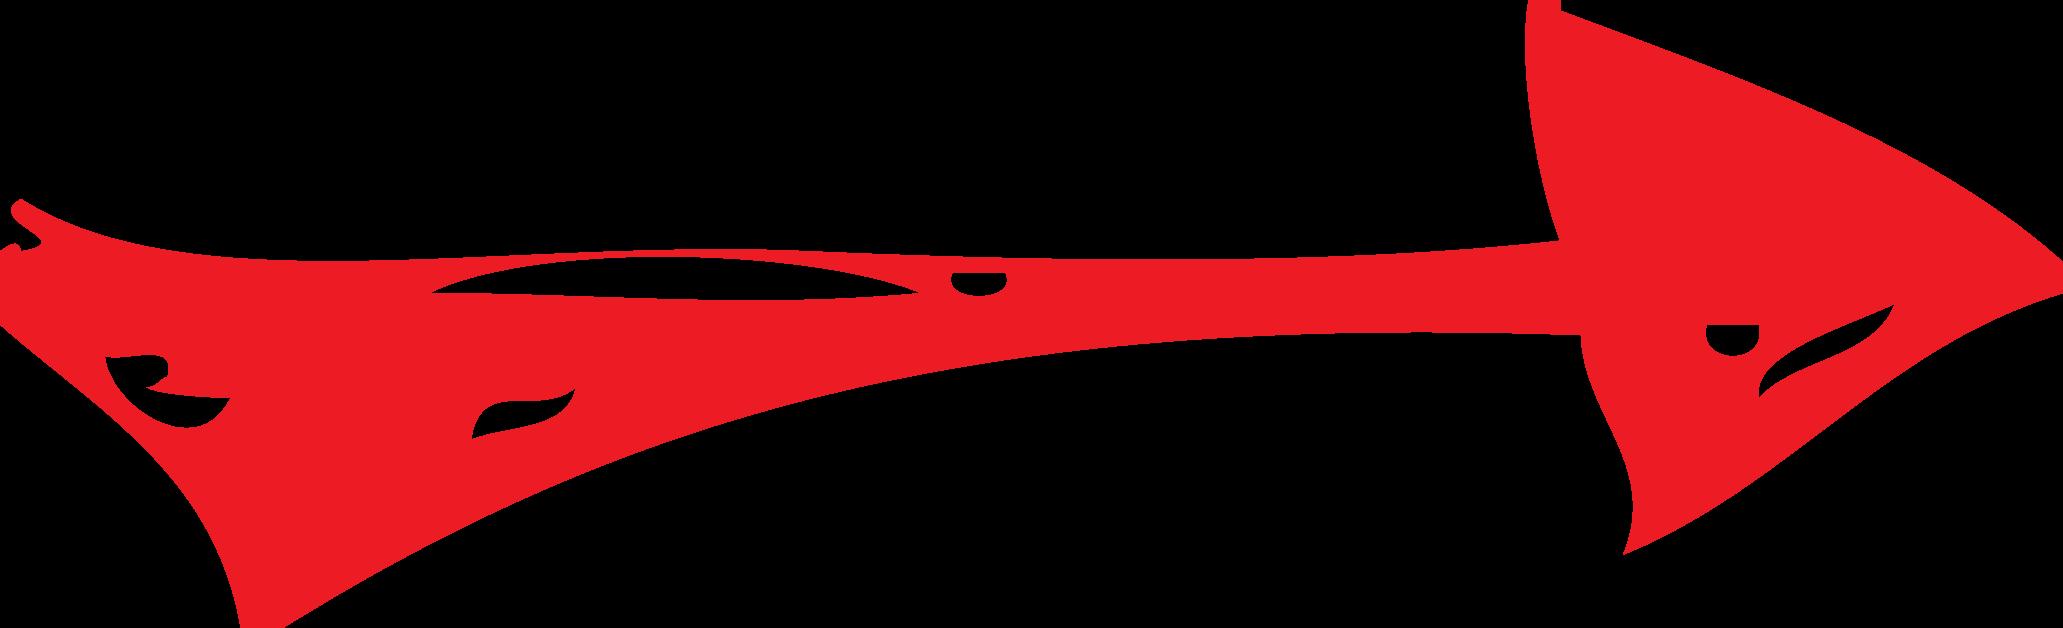 Arrow_red